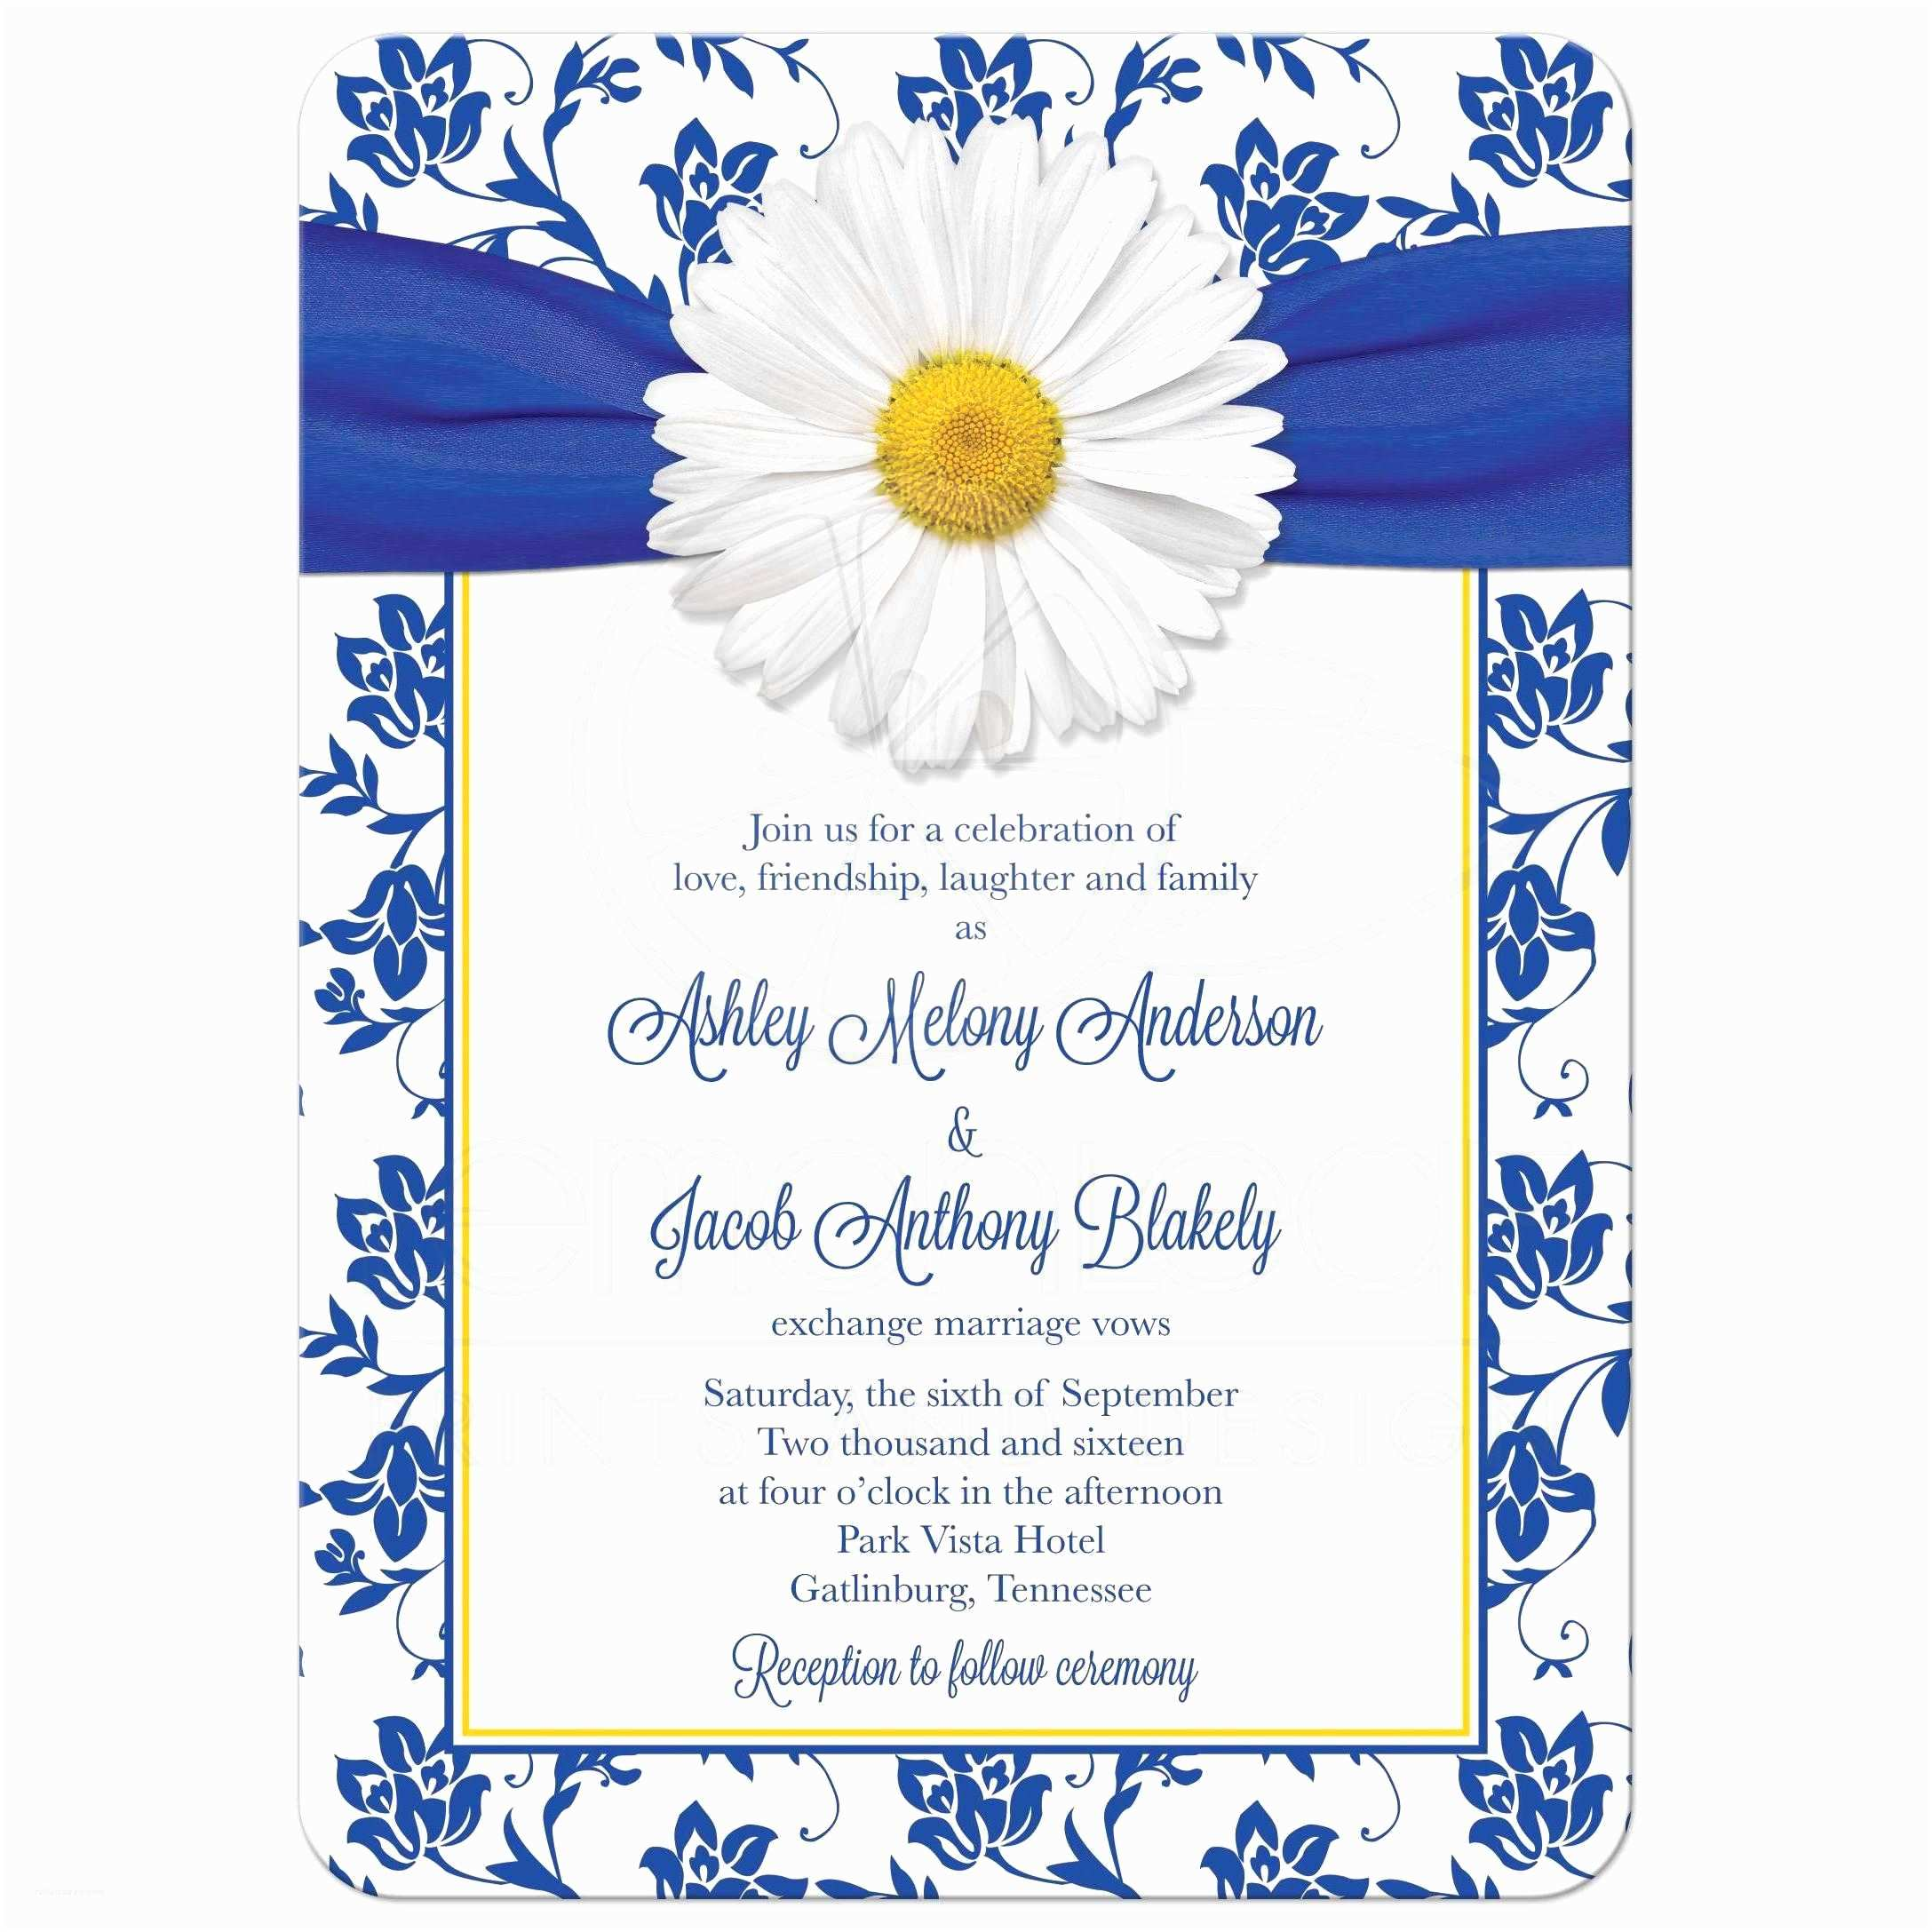 Wedding Engagement Invitation Daisy Wedding Invitation Royal Blue Floral Damask Ribbon